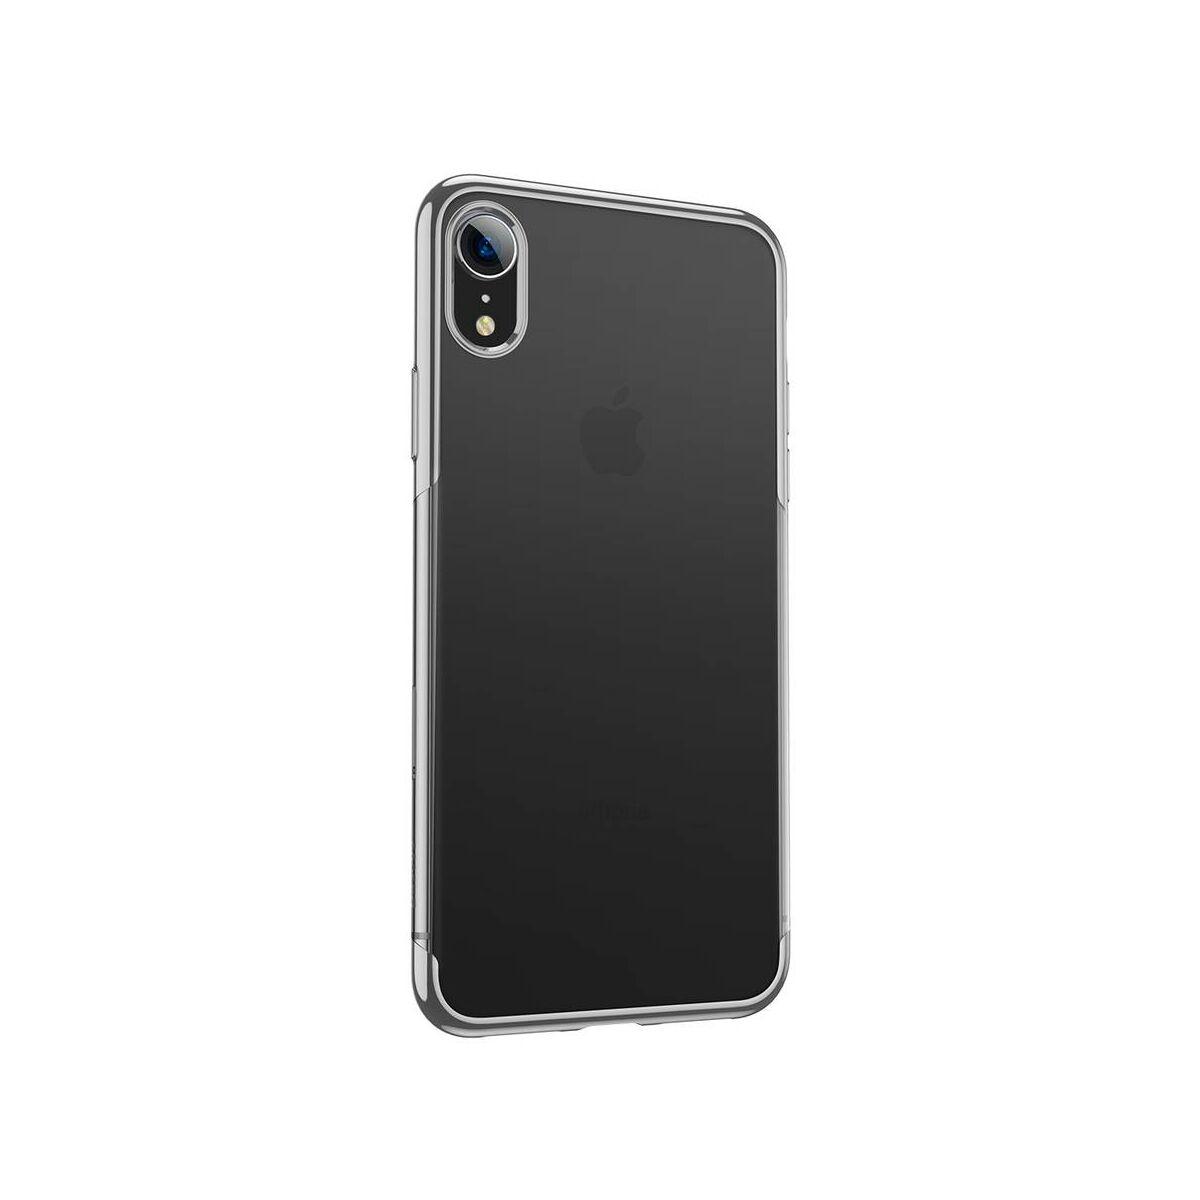 Baseus iPhone XR tok, Shining, ezüst (ARAPIPH61-MD0S)